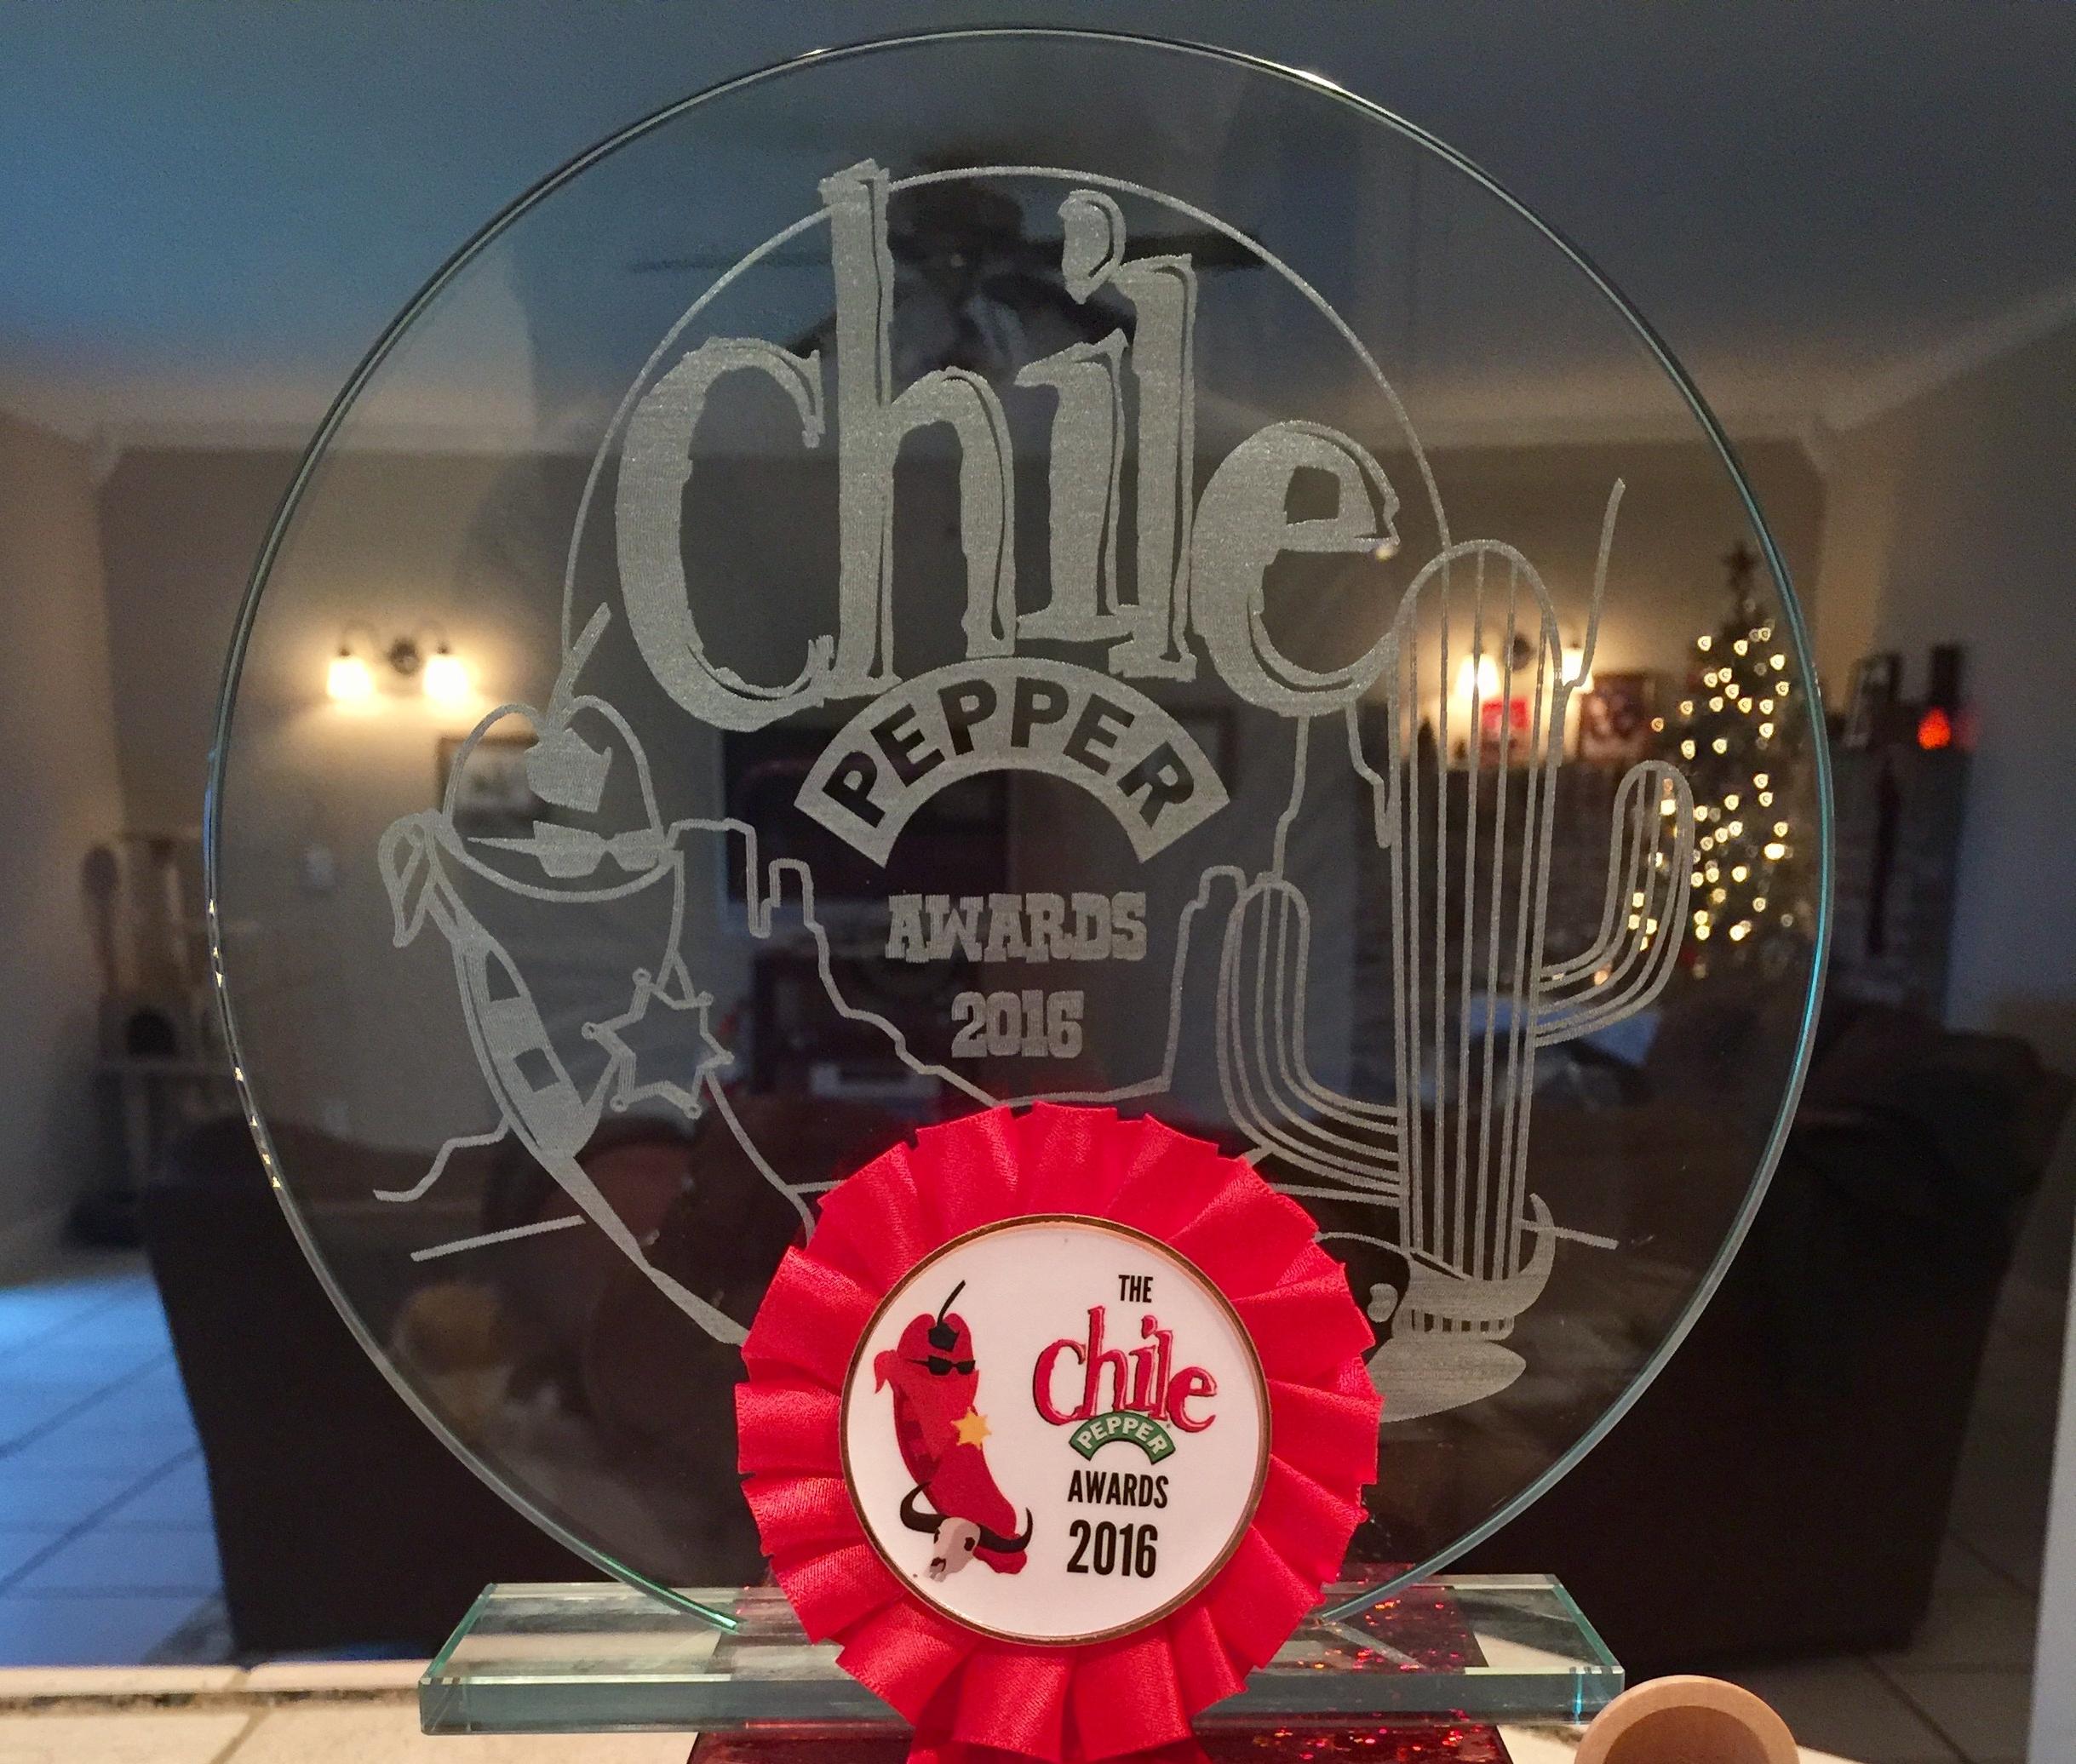 Chile Pepper Magazine Award